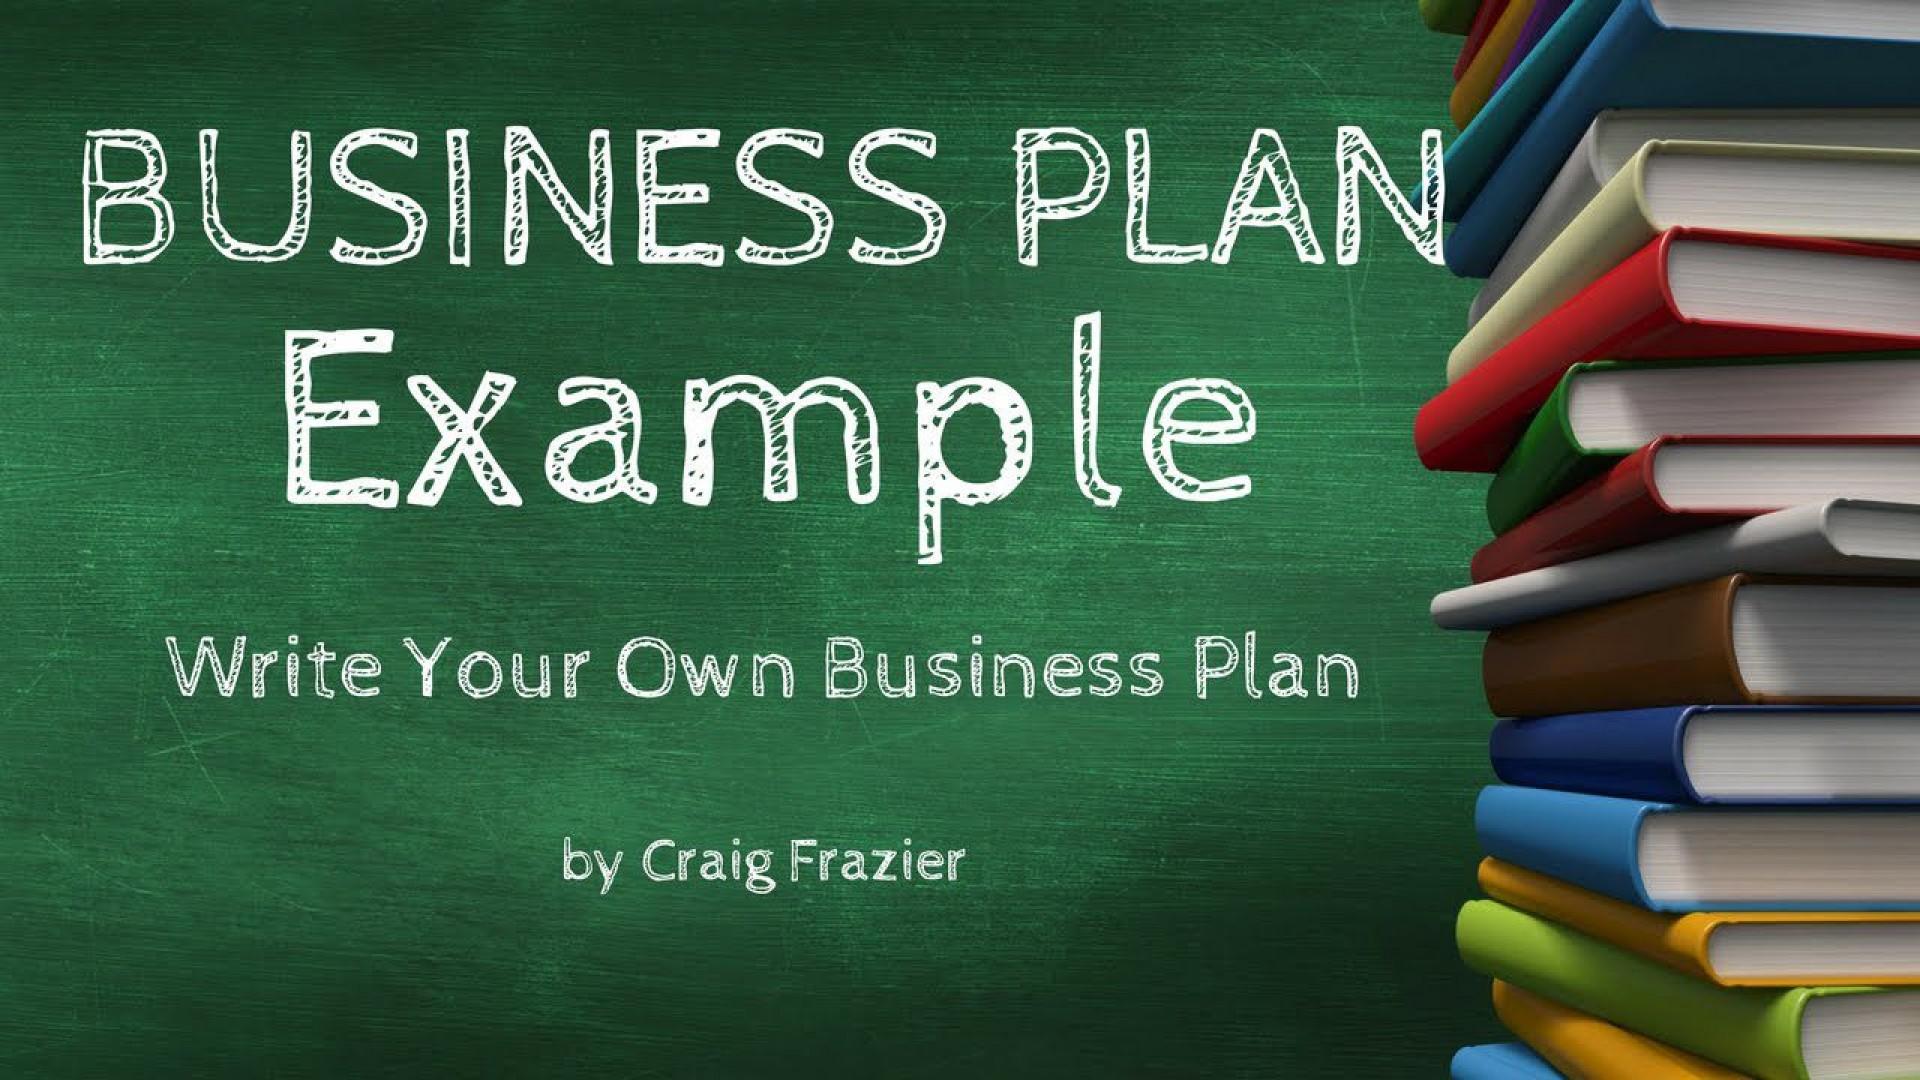 008 Excellent Startup Restaurant Busines Plan Sample Pdf Idea 1920